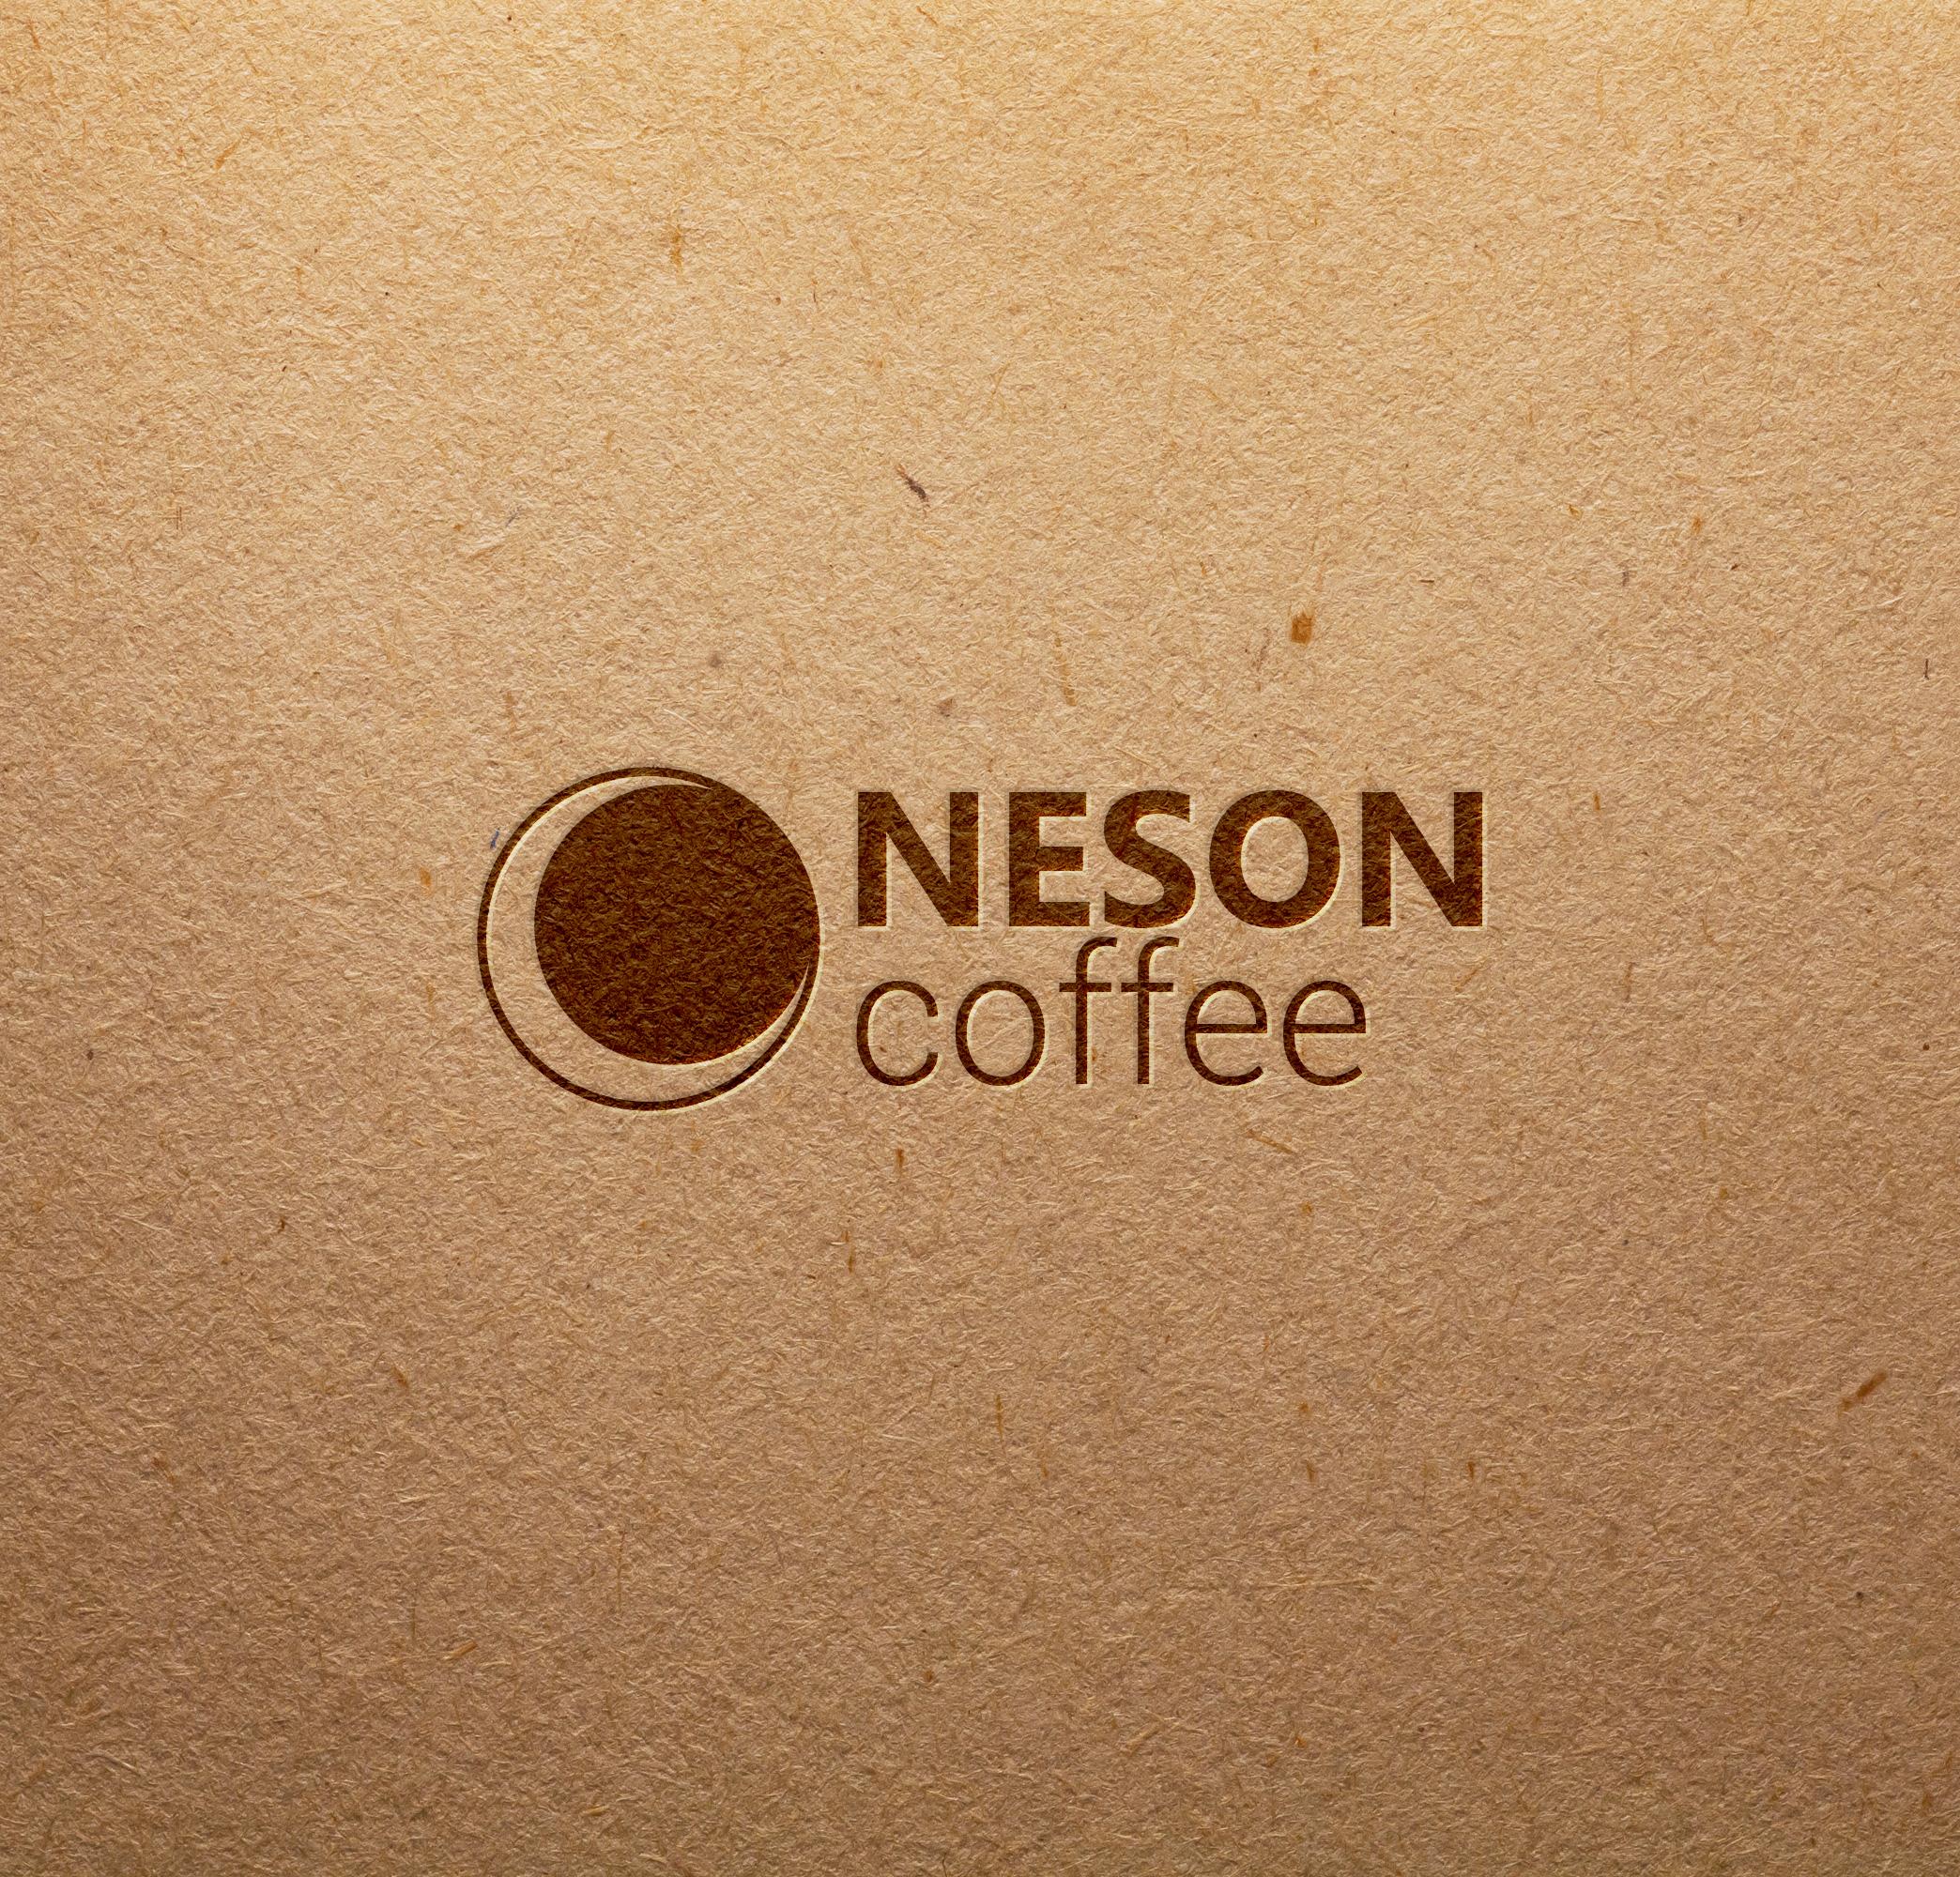 NESONcoffee LOGO